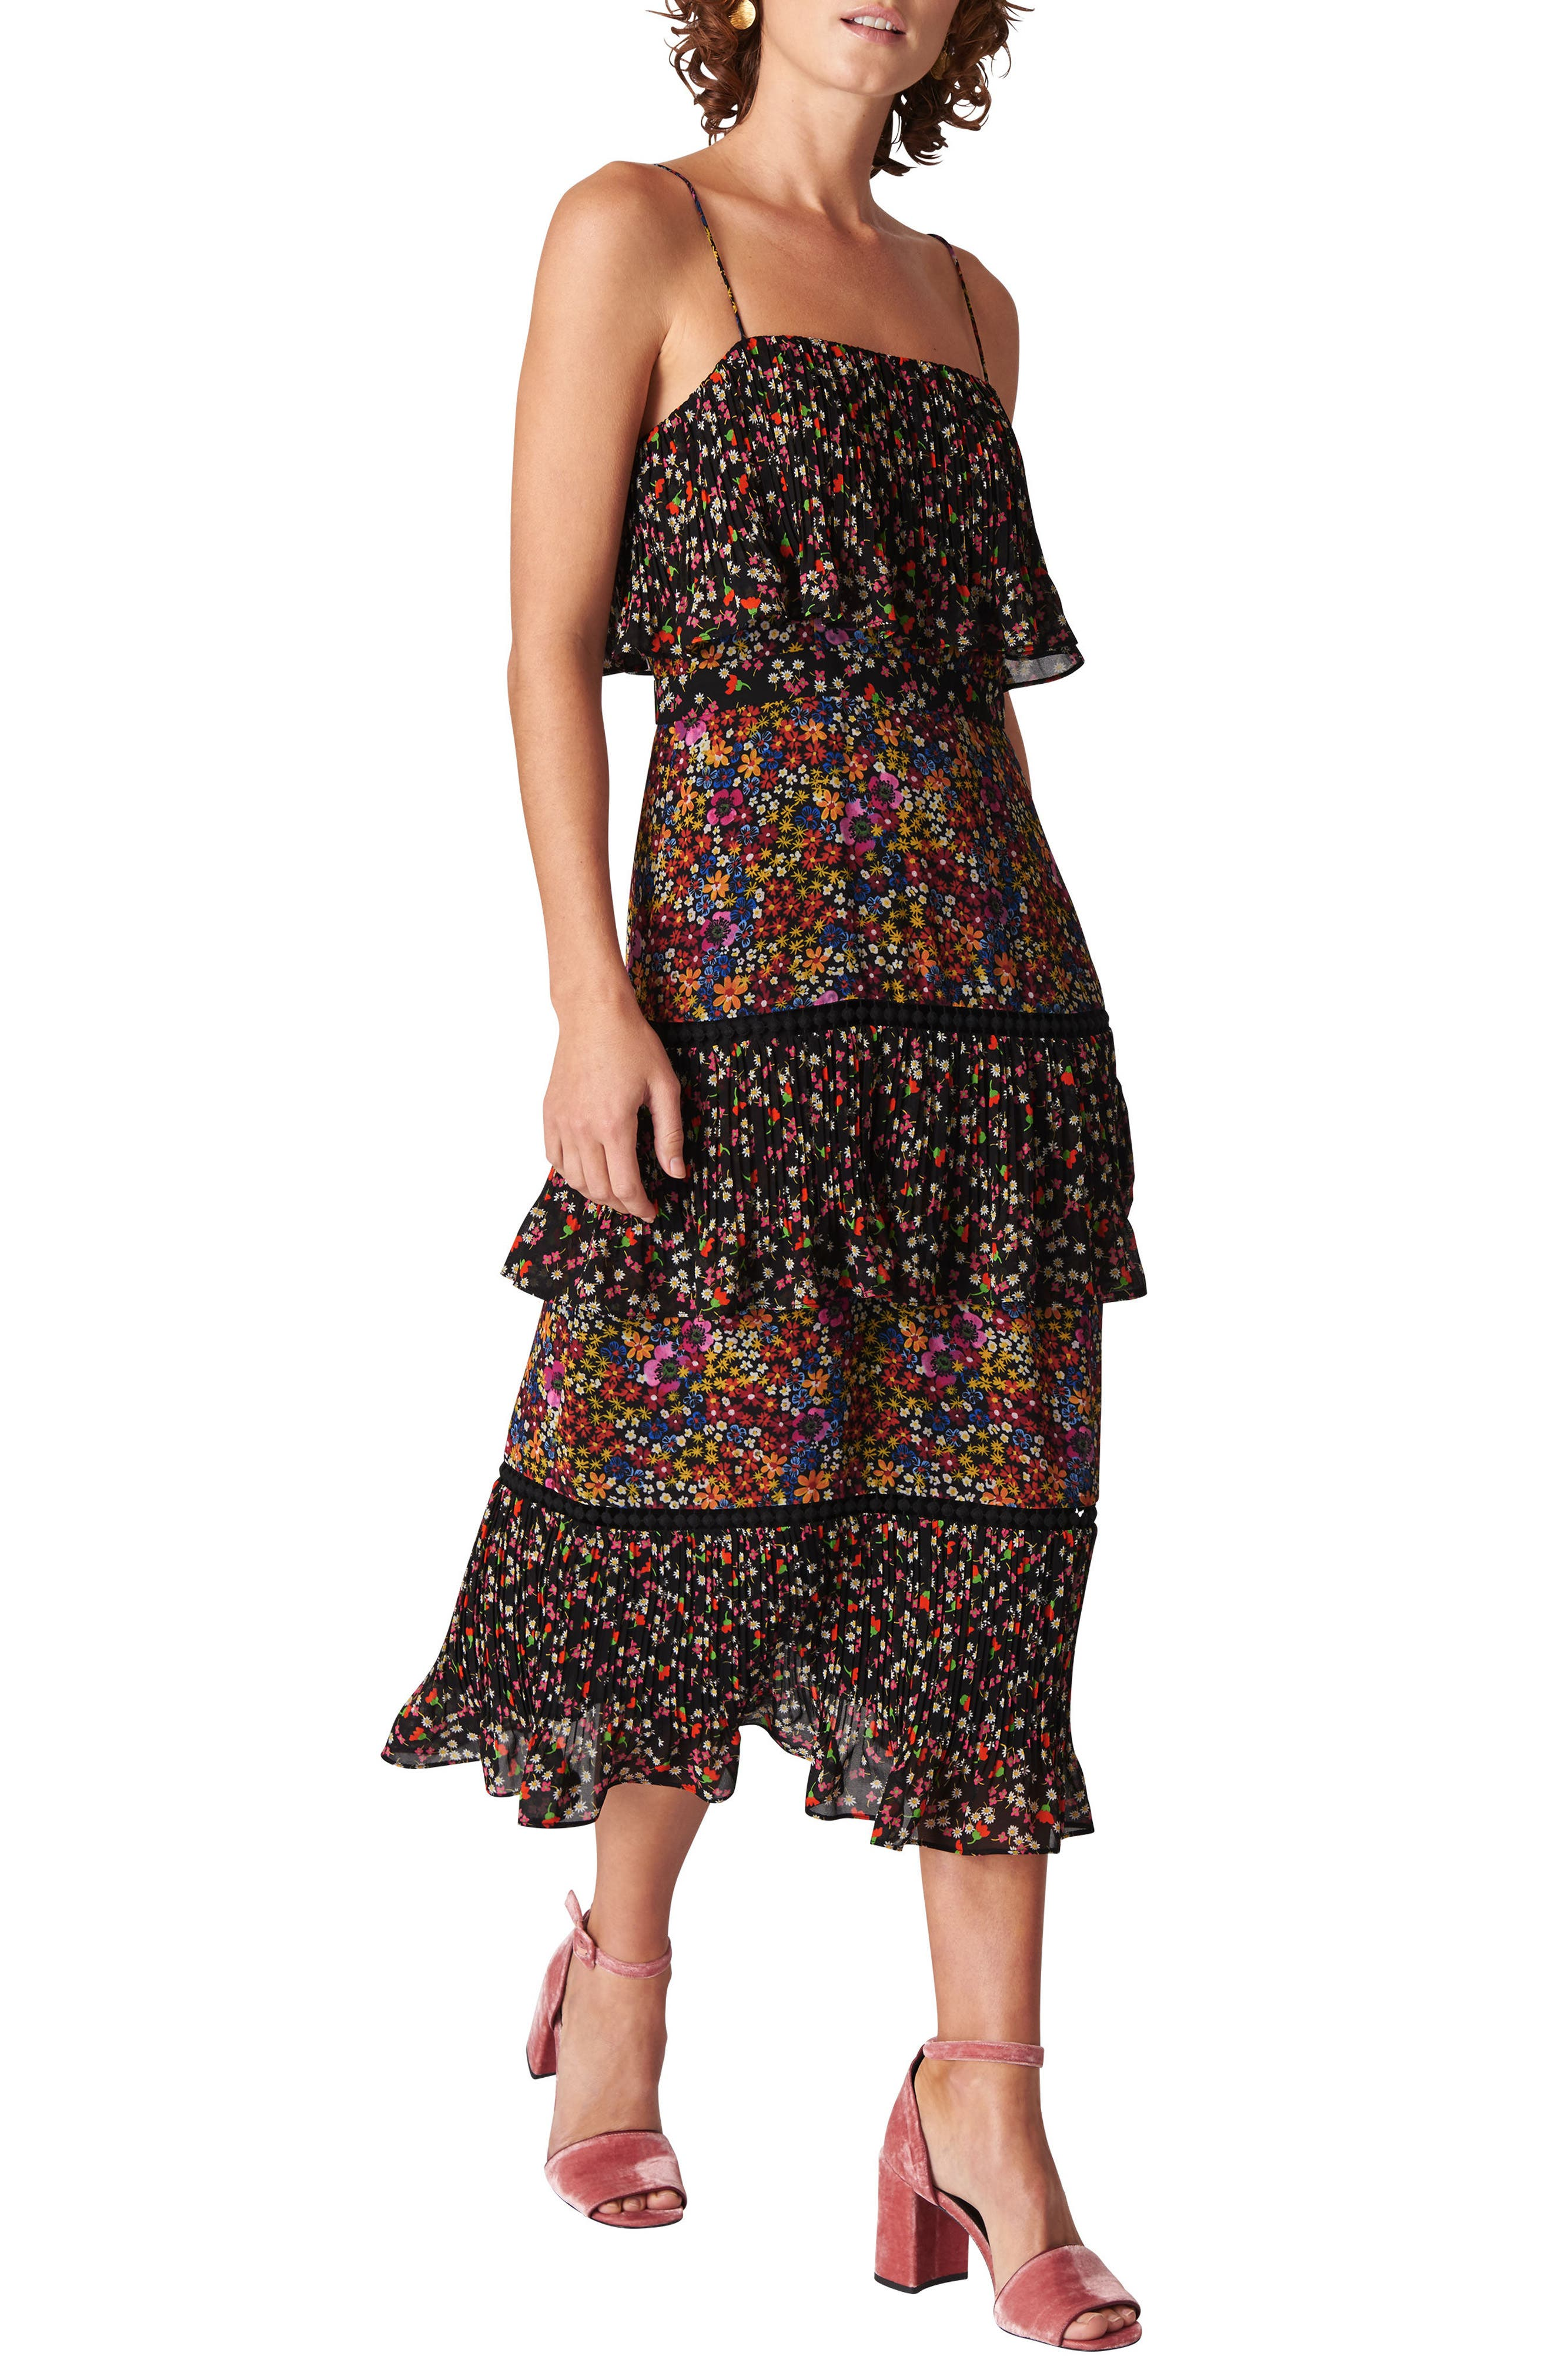 Skylar Peony Print Tiered Dress,                         Main,                         color, BLACK/ MULTI